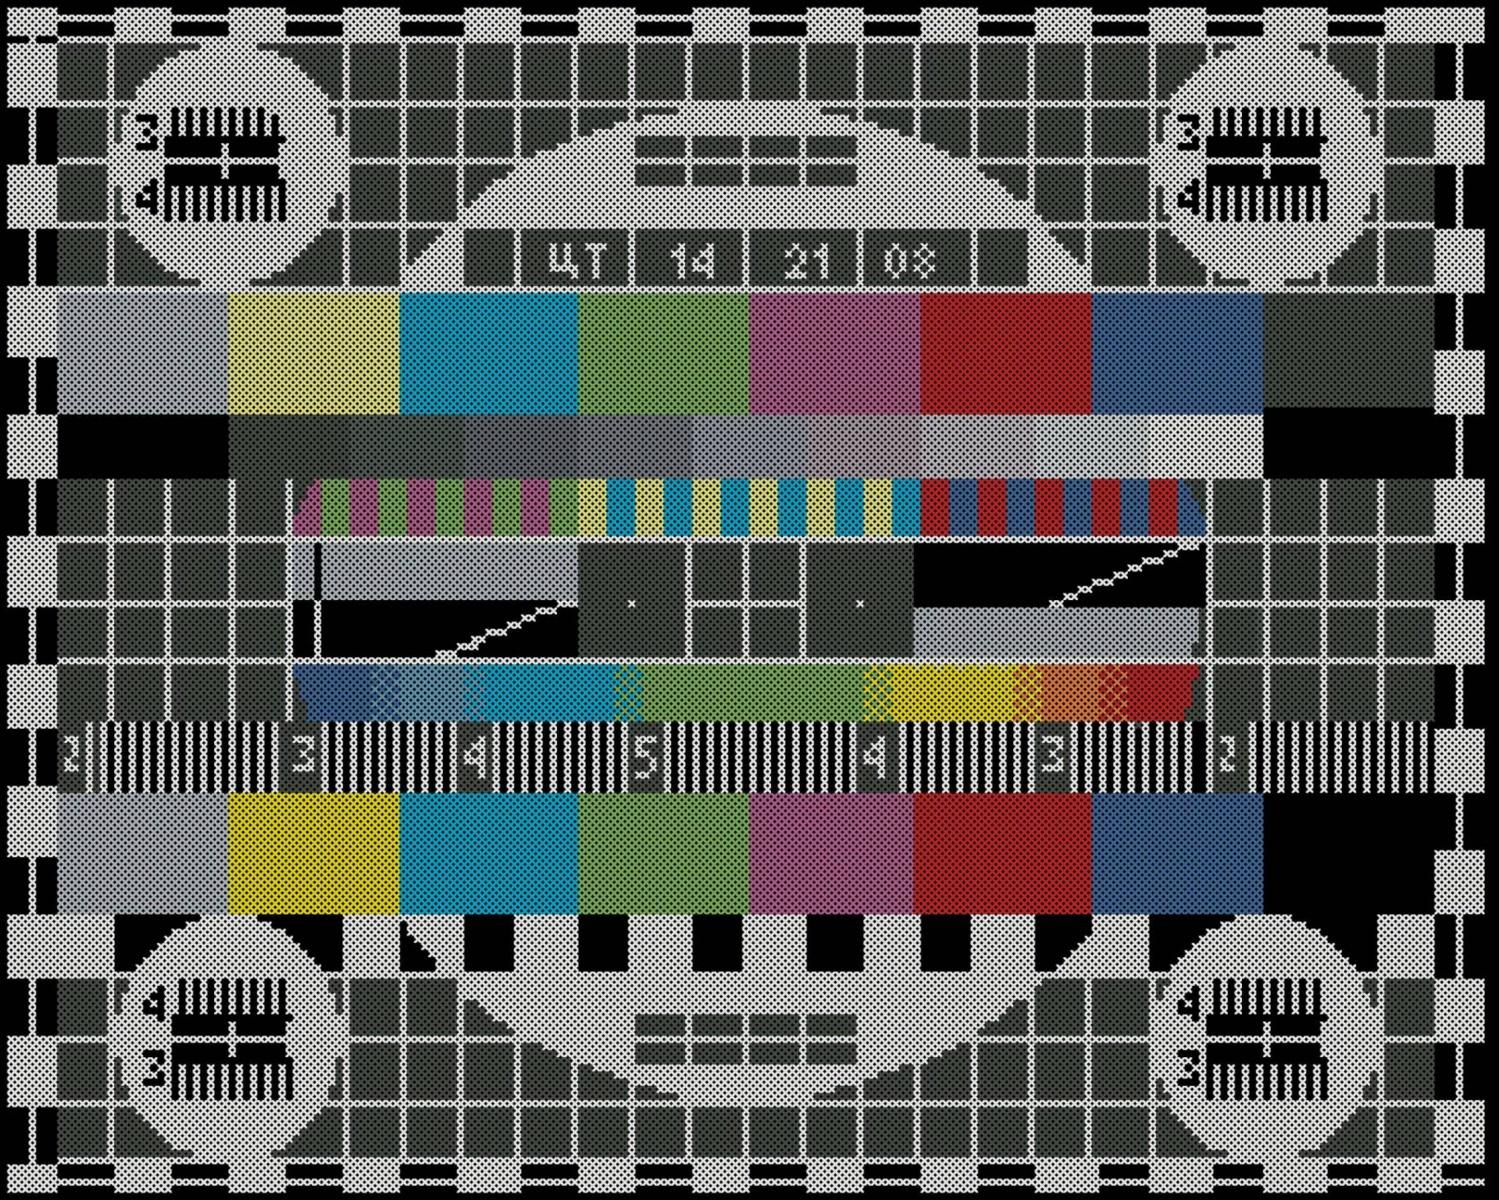 Картинка профилактики на телевизоре